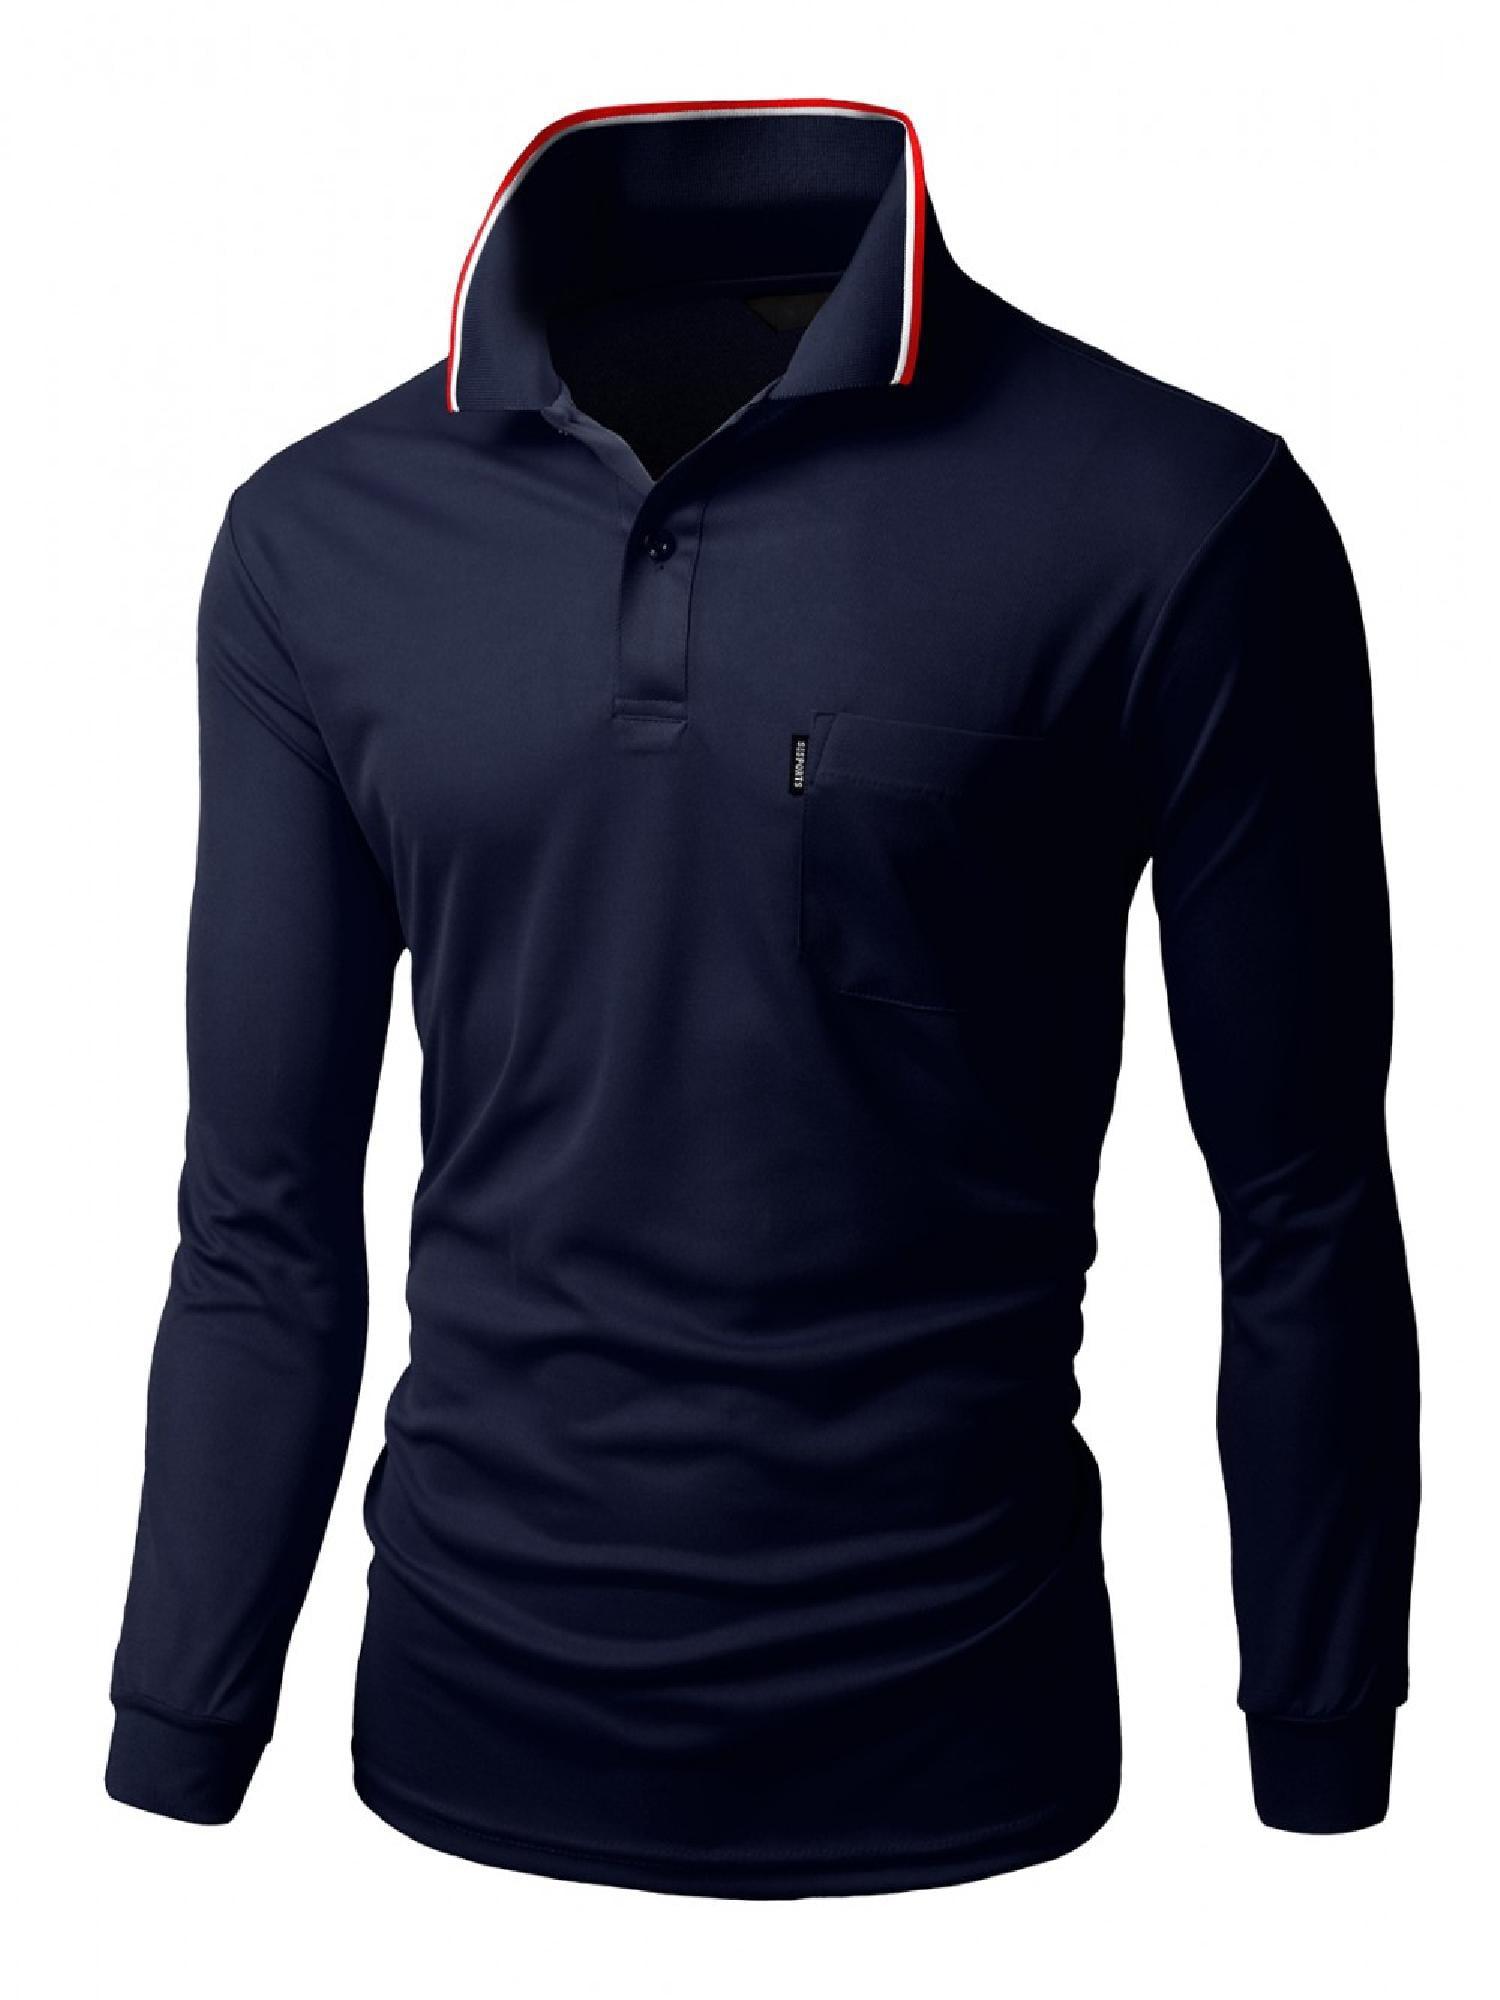 c46144a27f7f Long Sleeve Pocket T Shirts Walmart - raveitsafe